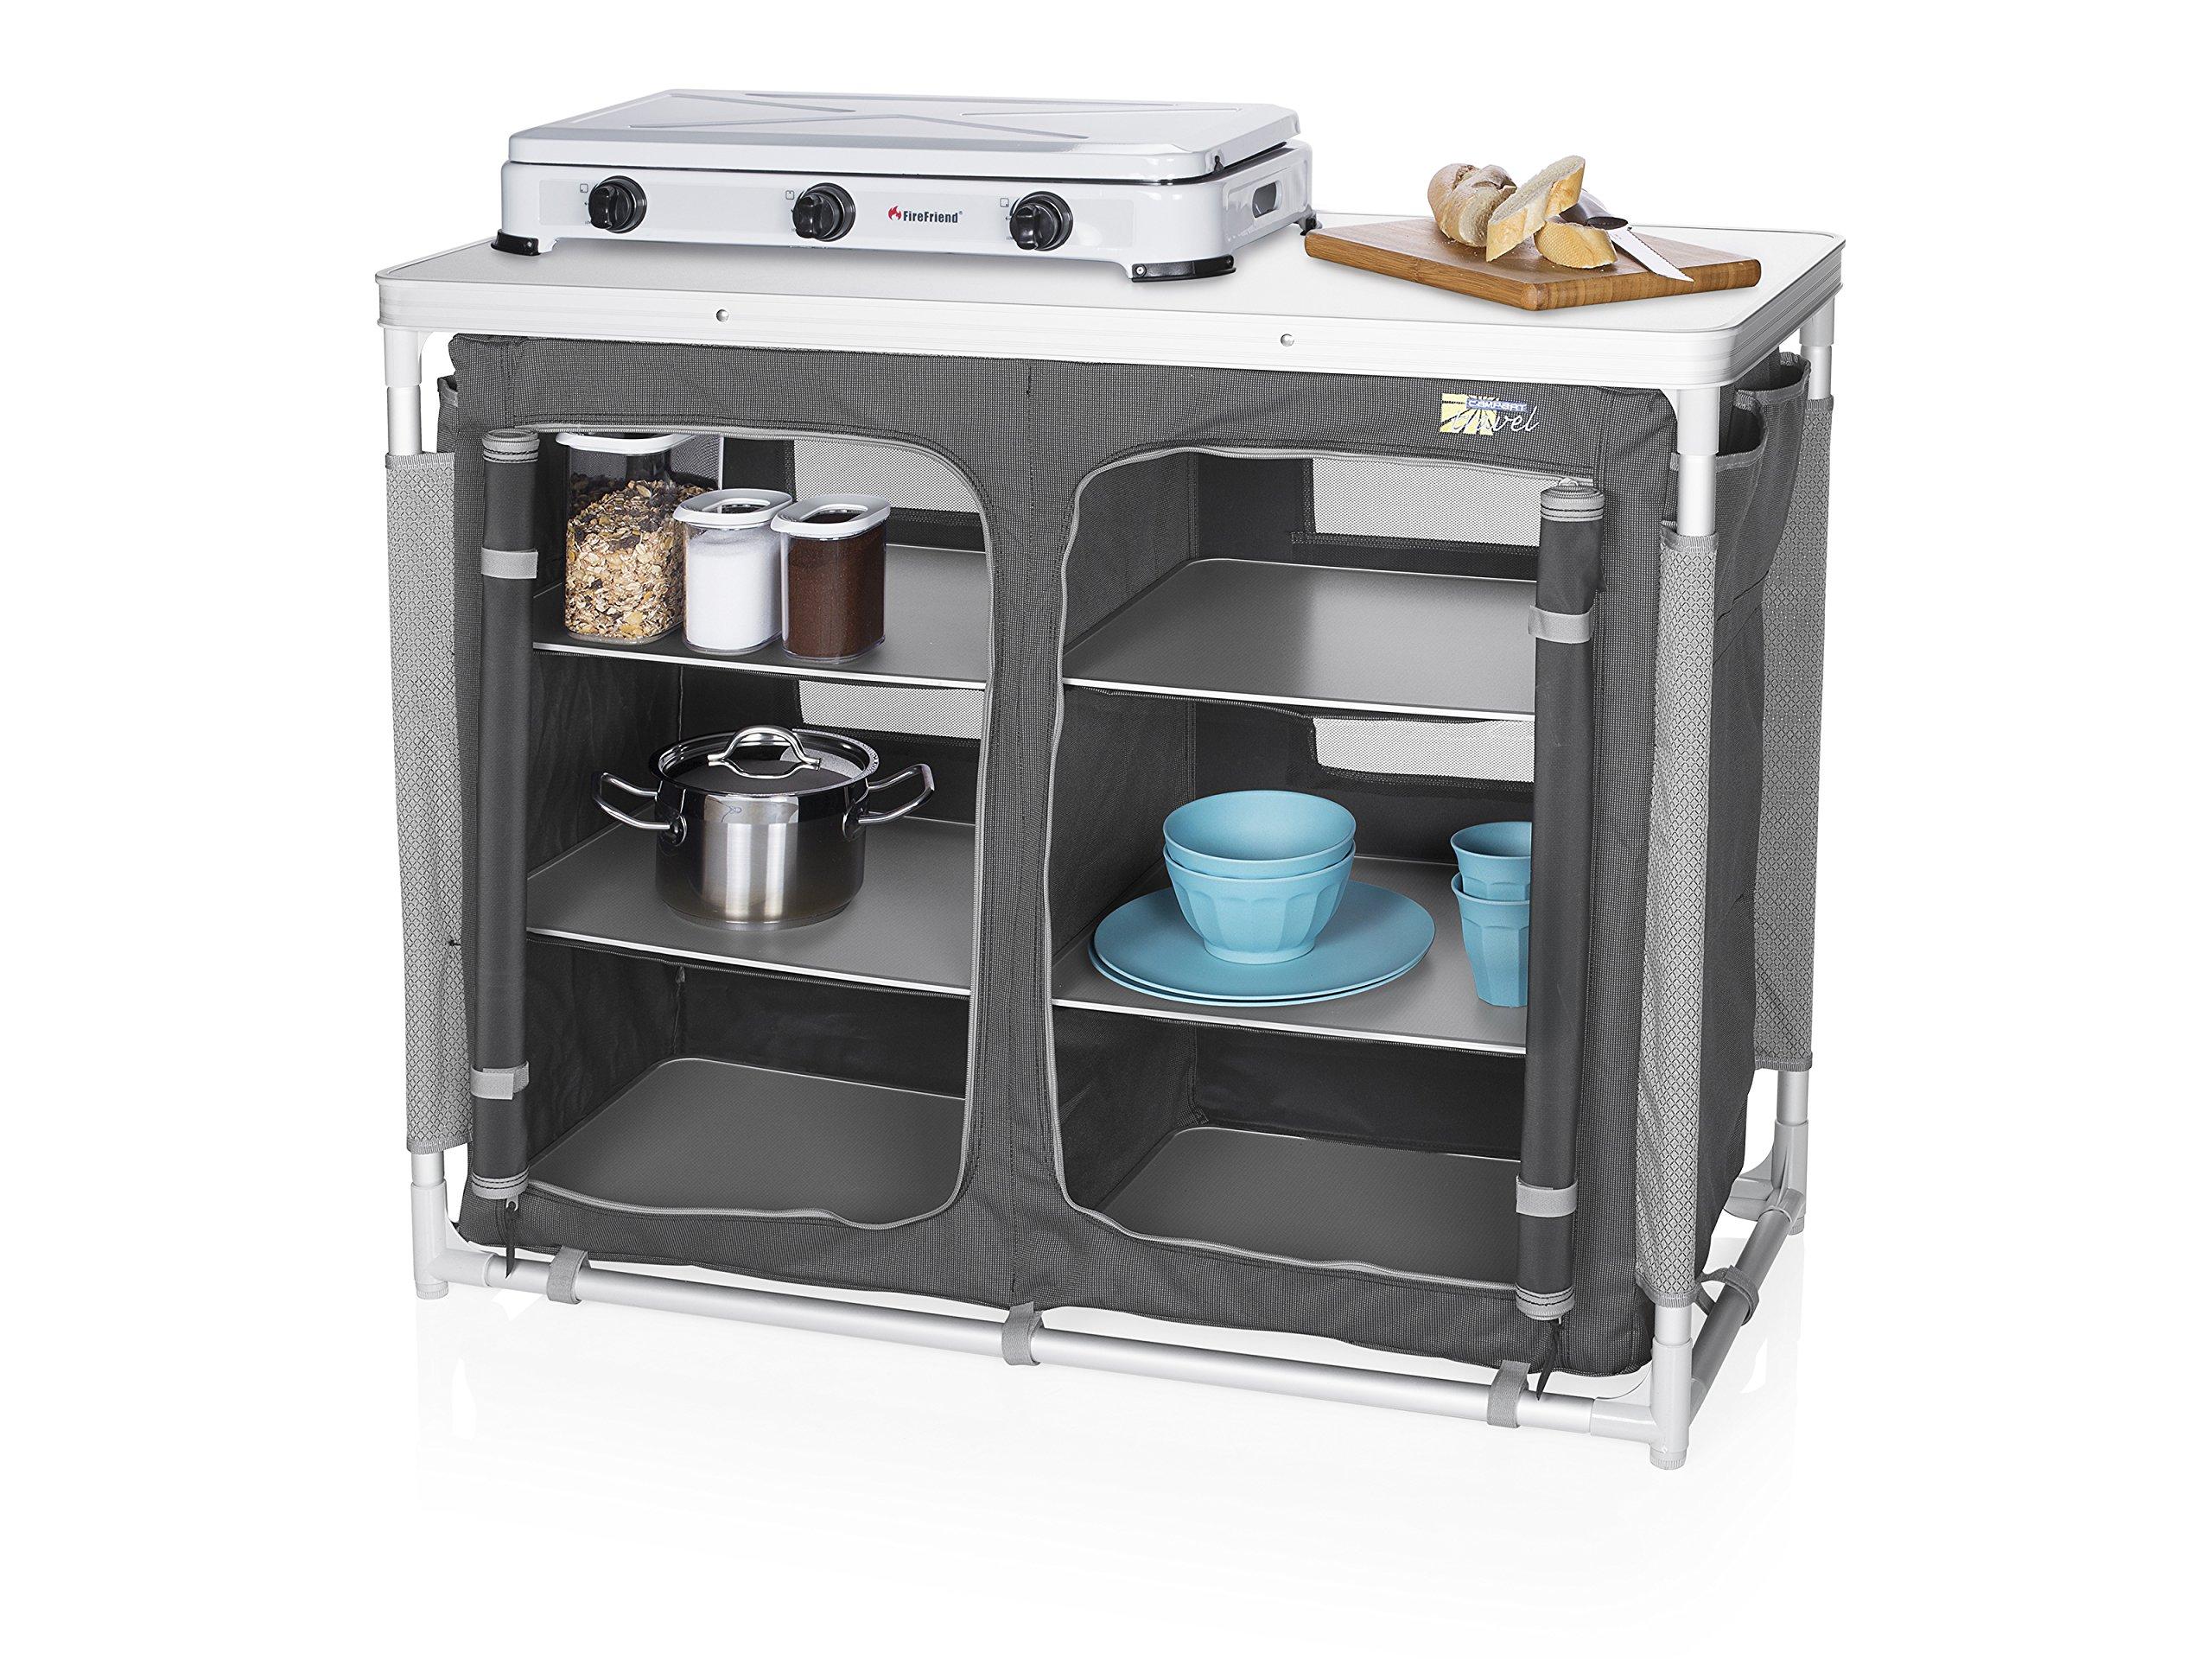 Cocina de camping Madrid Campart Travel KI-0734 – Seis compartimentos – Bolsa de almacenamiento